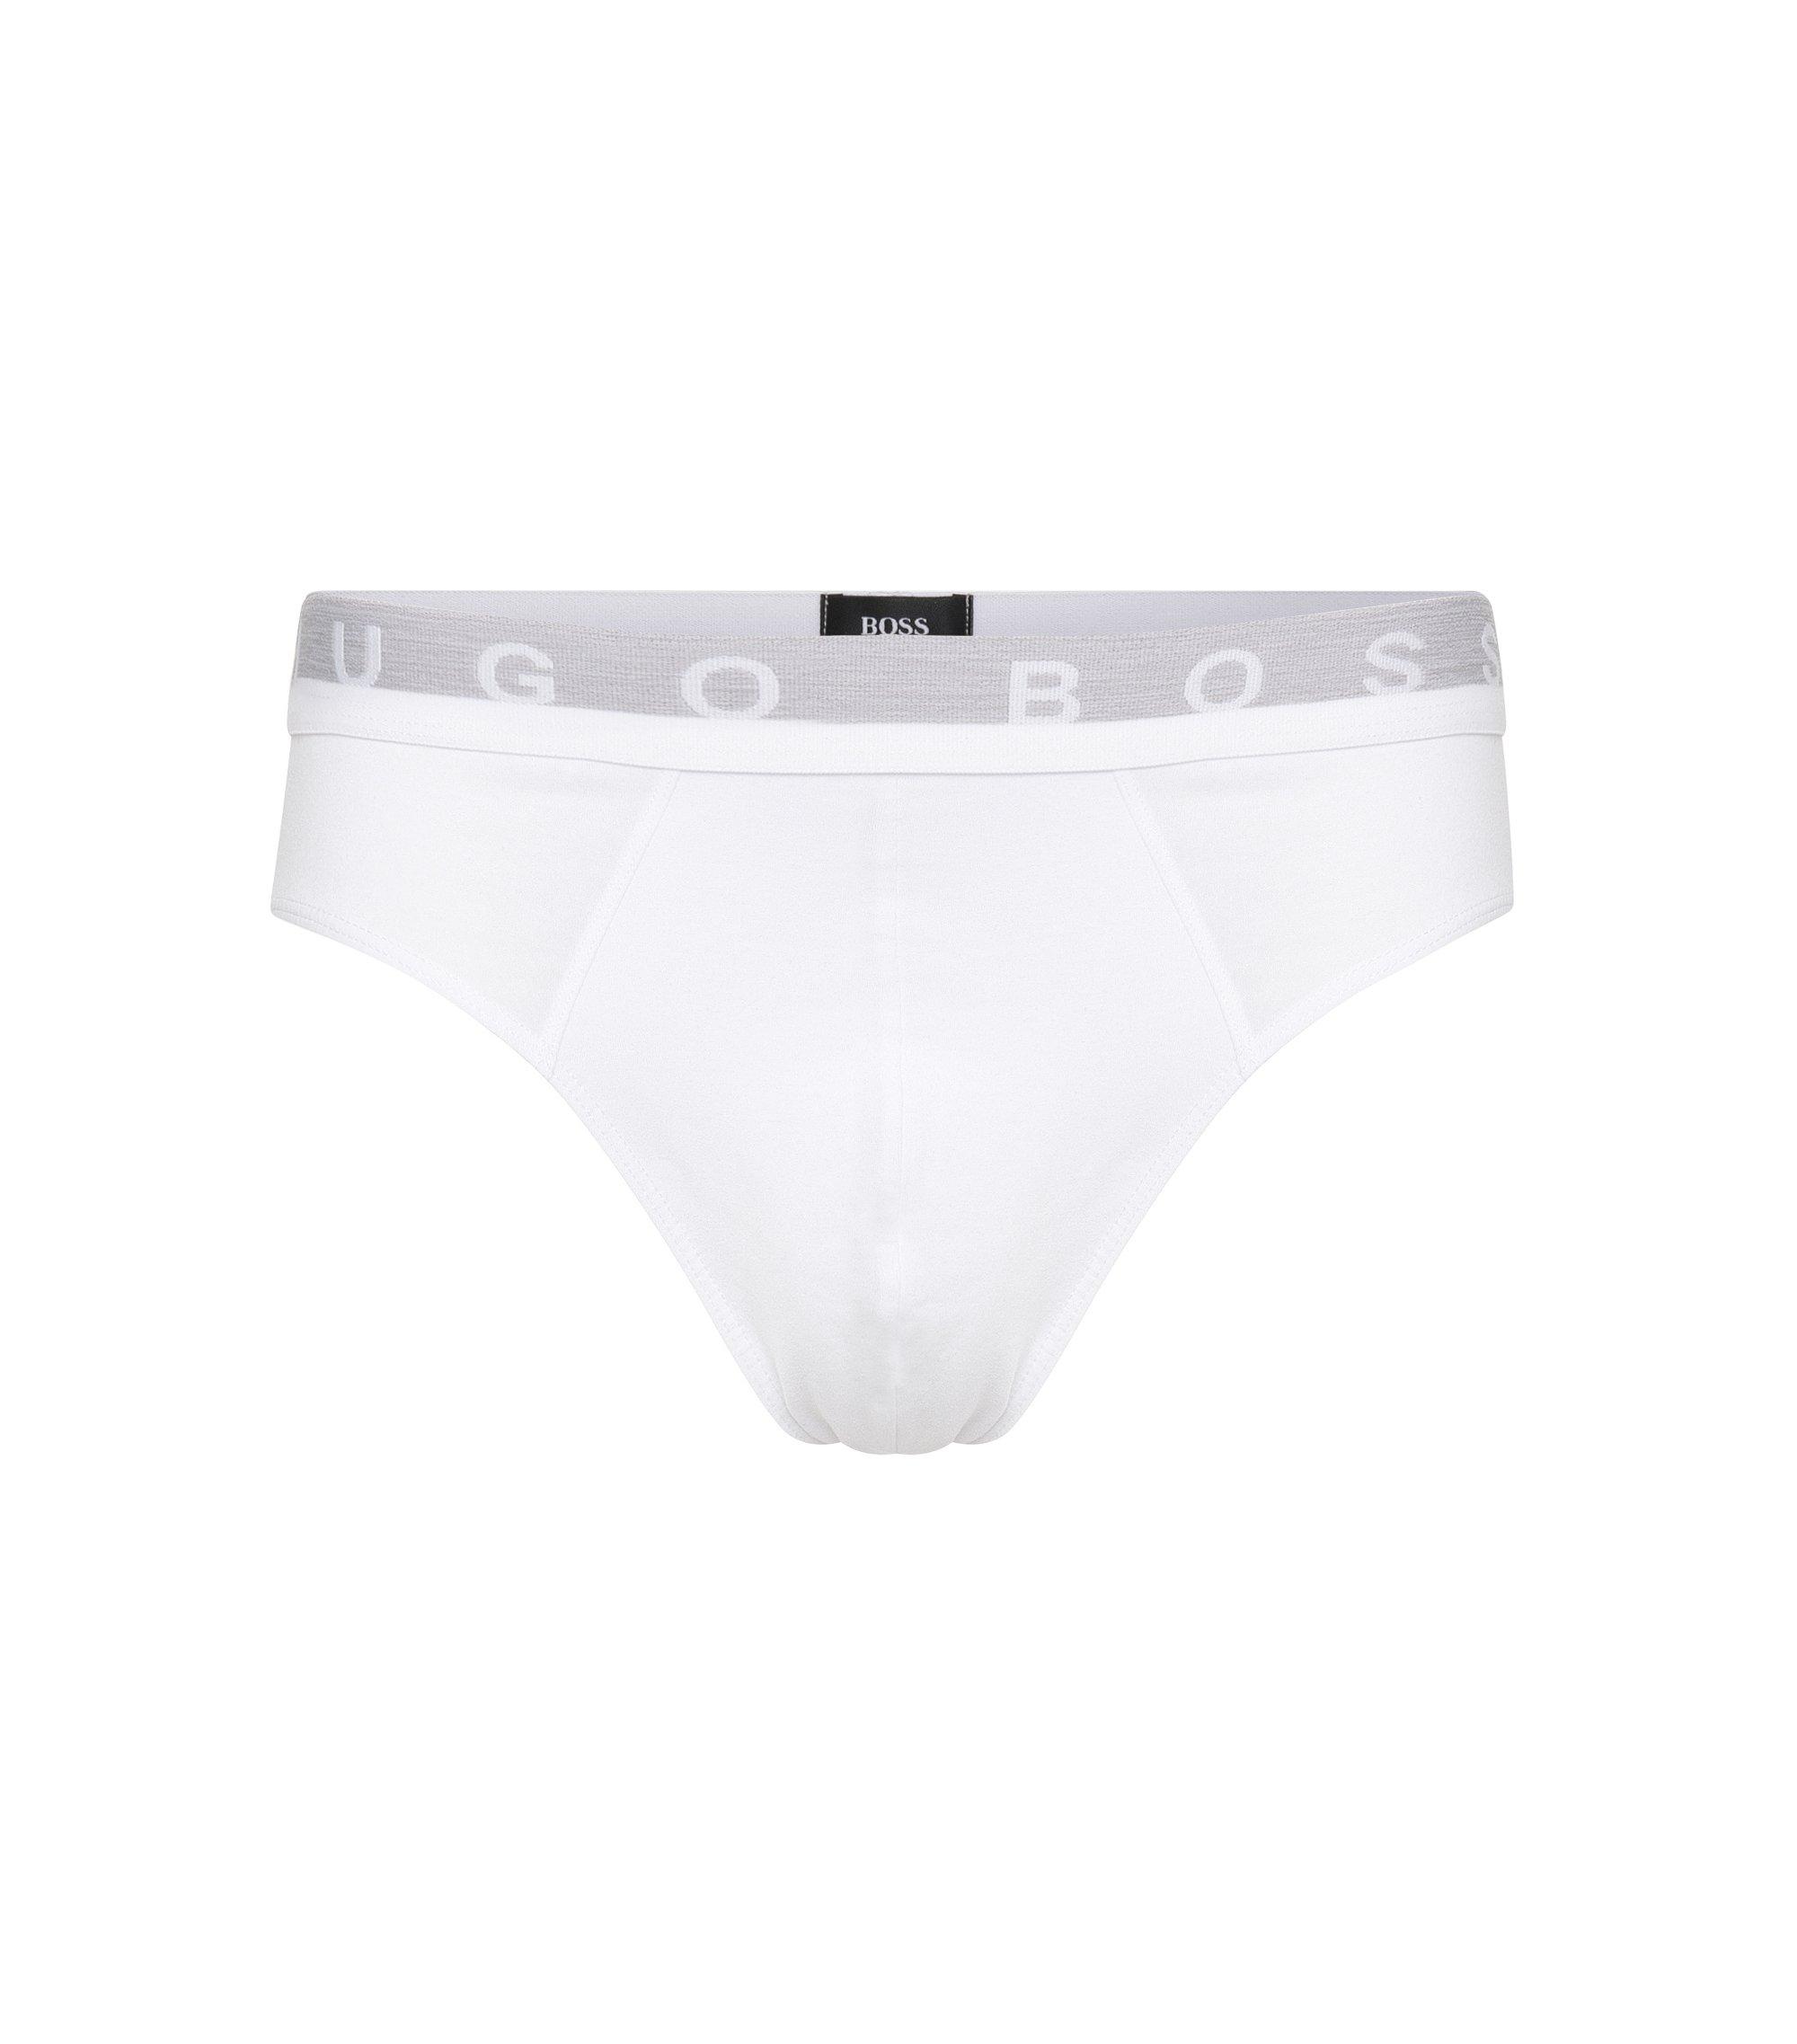 Calzoncillos cortos en algodón elástico con detalle de logo , Blanco